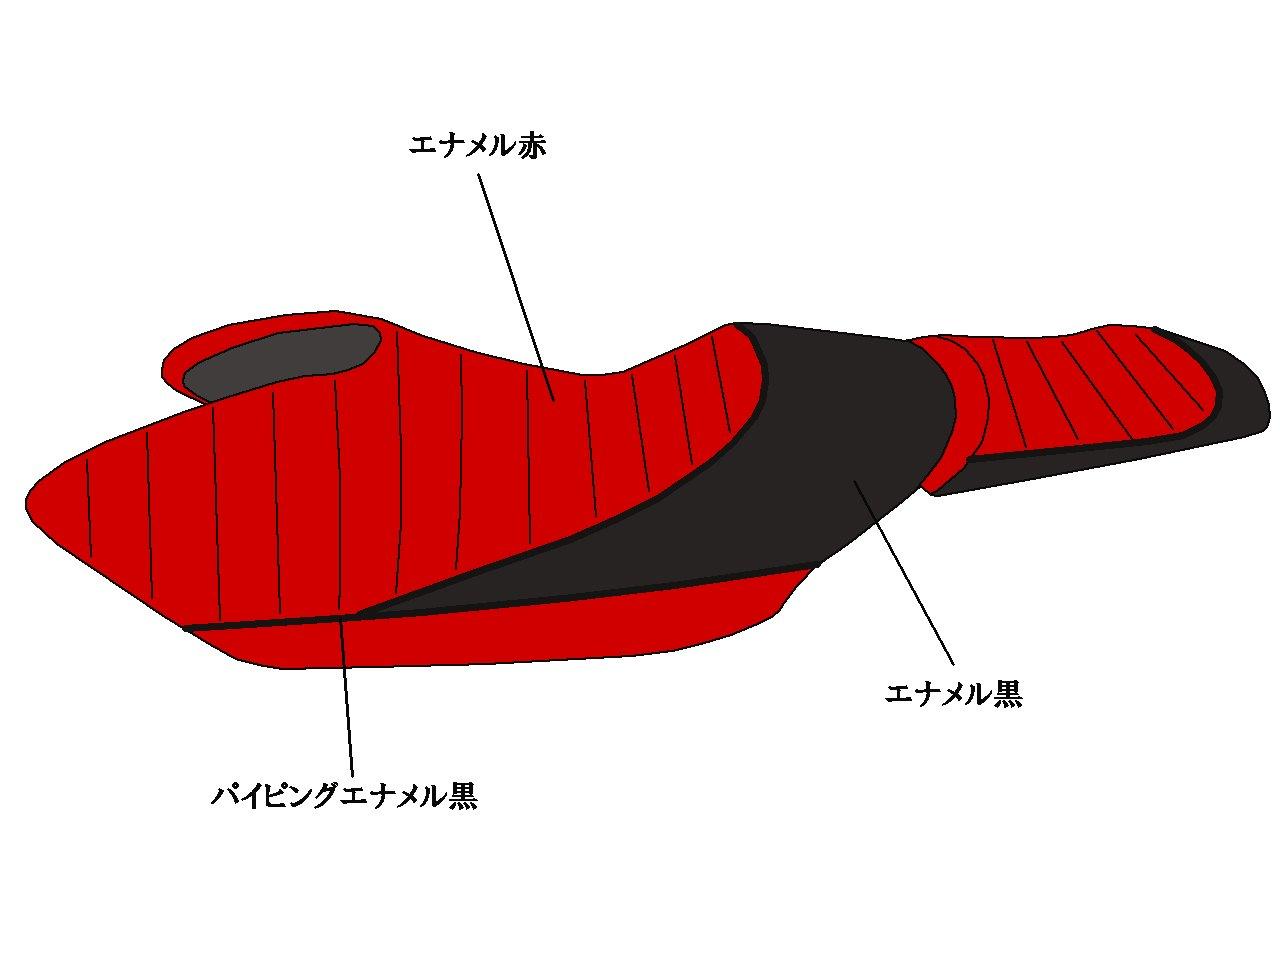 http://customseat.jp/first_website/customblog/IMG_0320.JPG